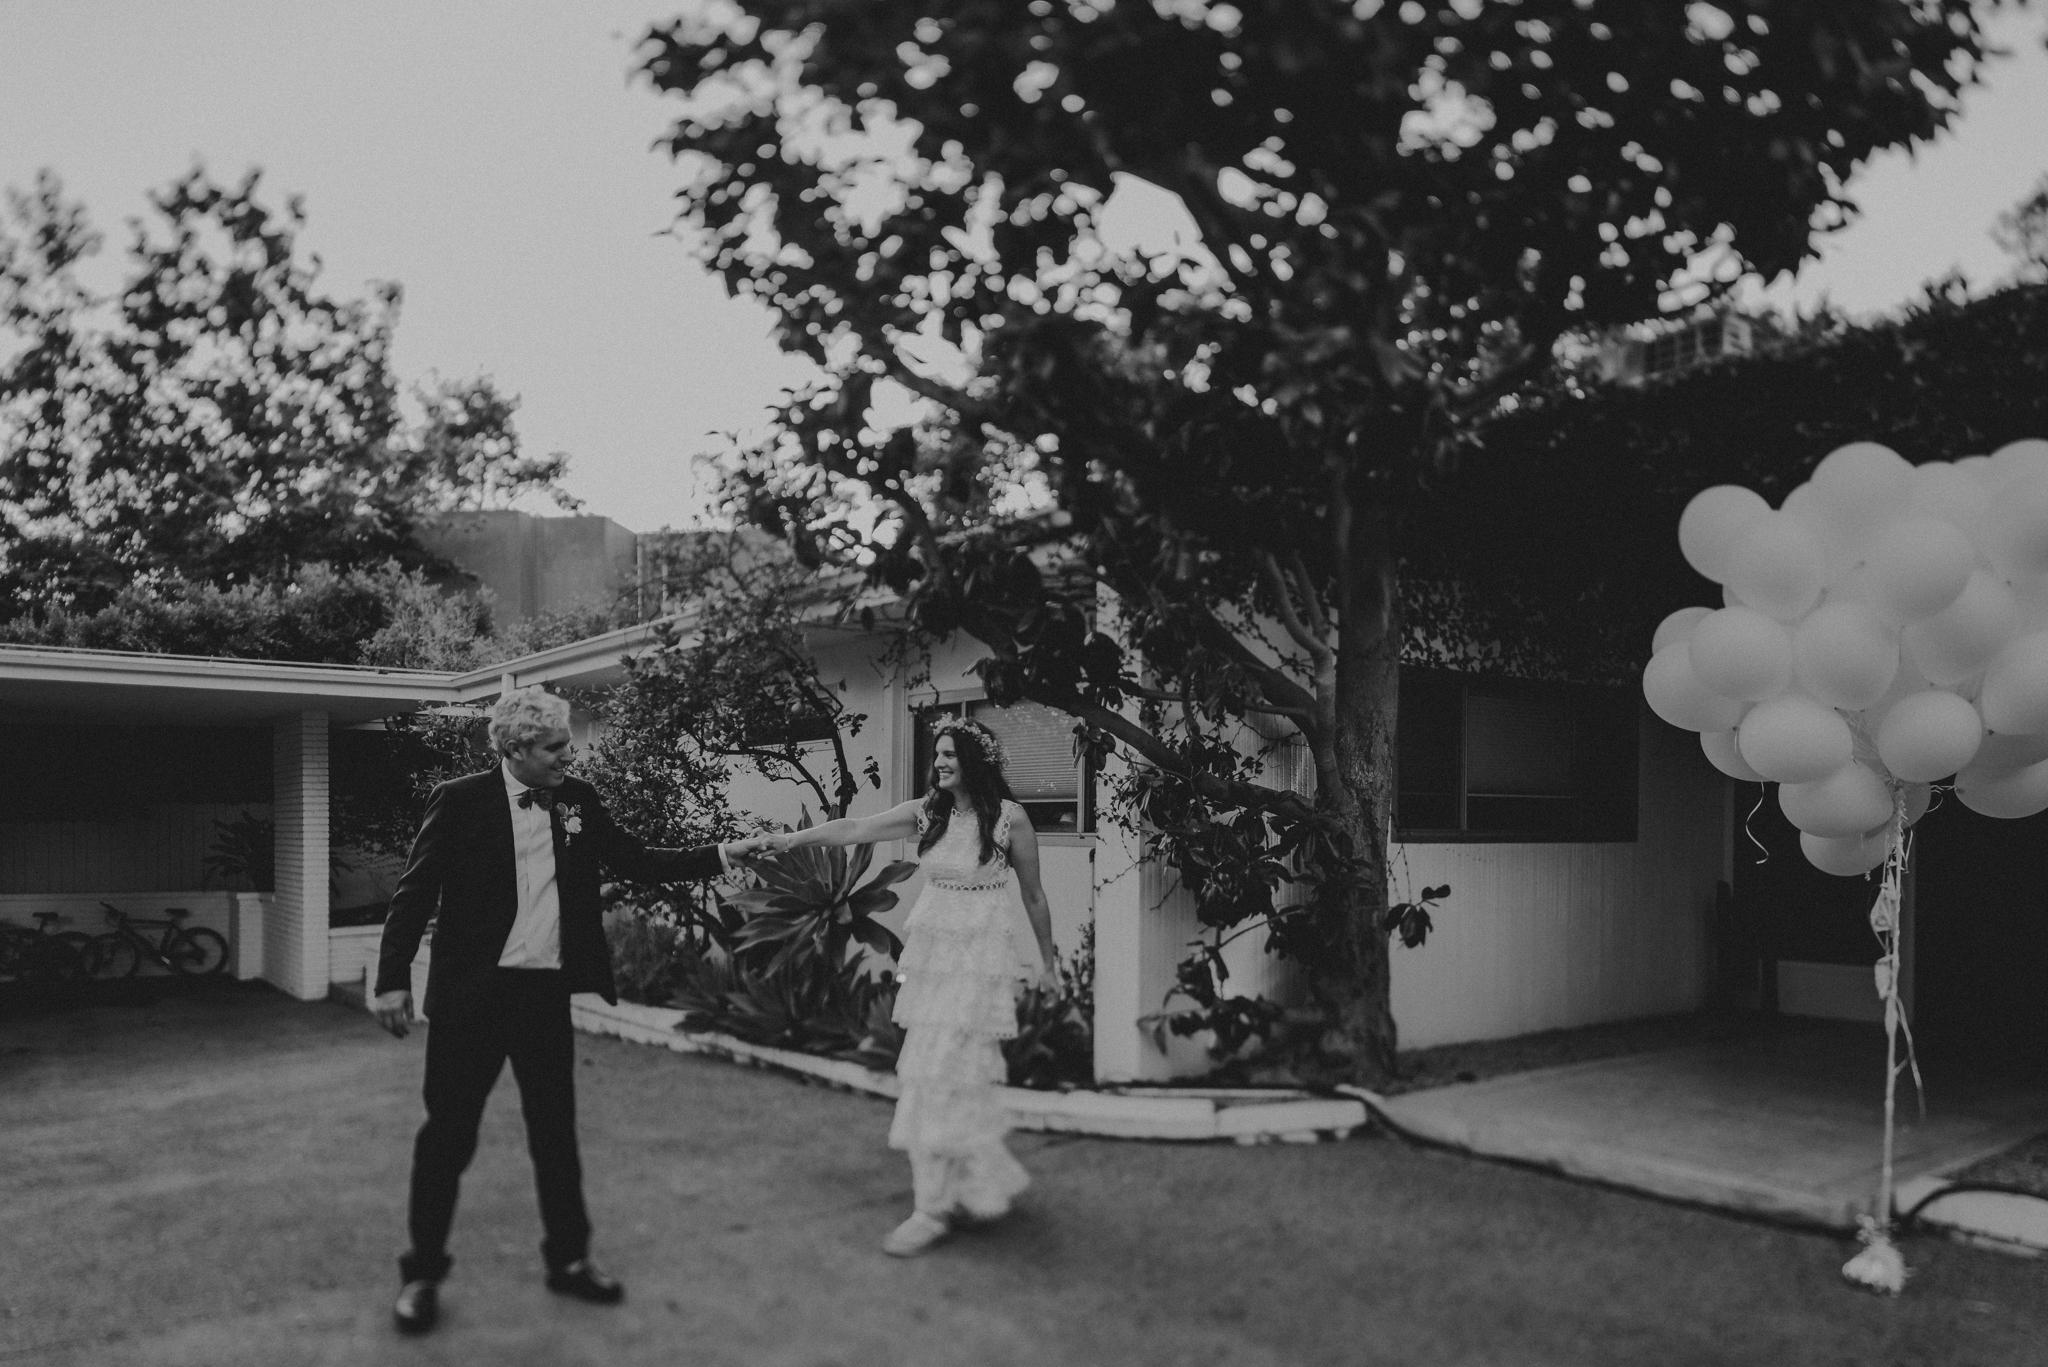 Isaiah + Taylor Photography - Private Estate Backyard Wedding - Beverly Hills - Los Angeles Wedding Photographer - 101.jpg